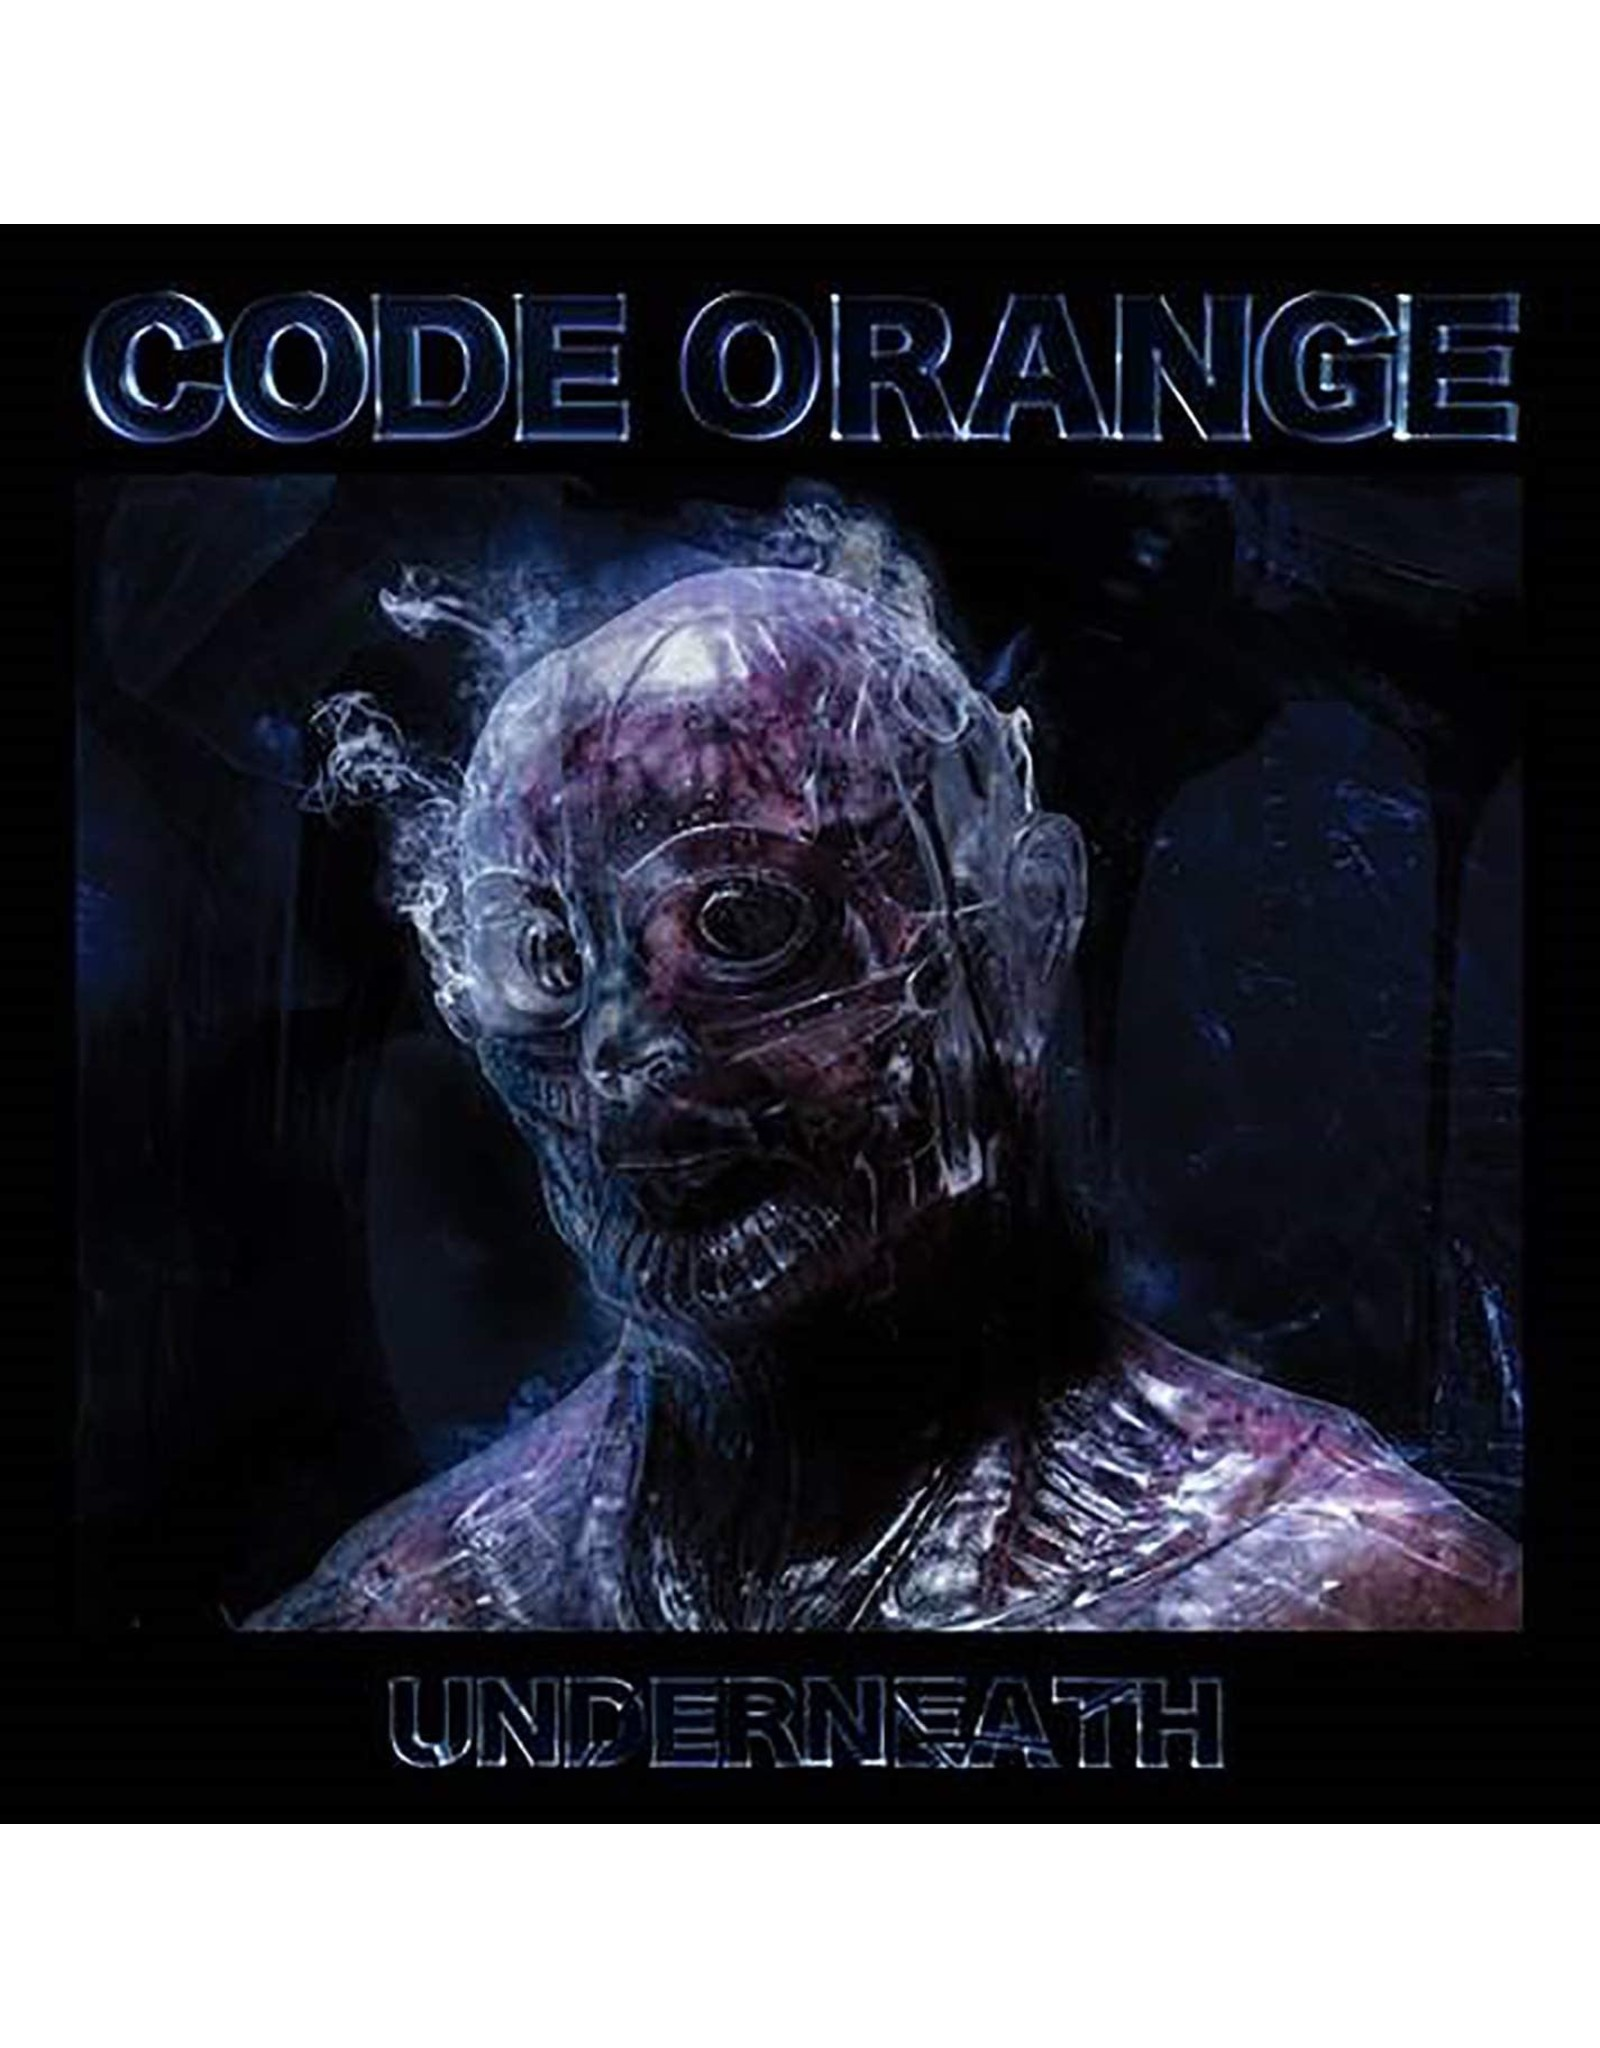 Code Orange - Underneath (Translucent Galaxy Vinyl)